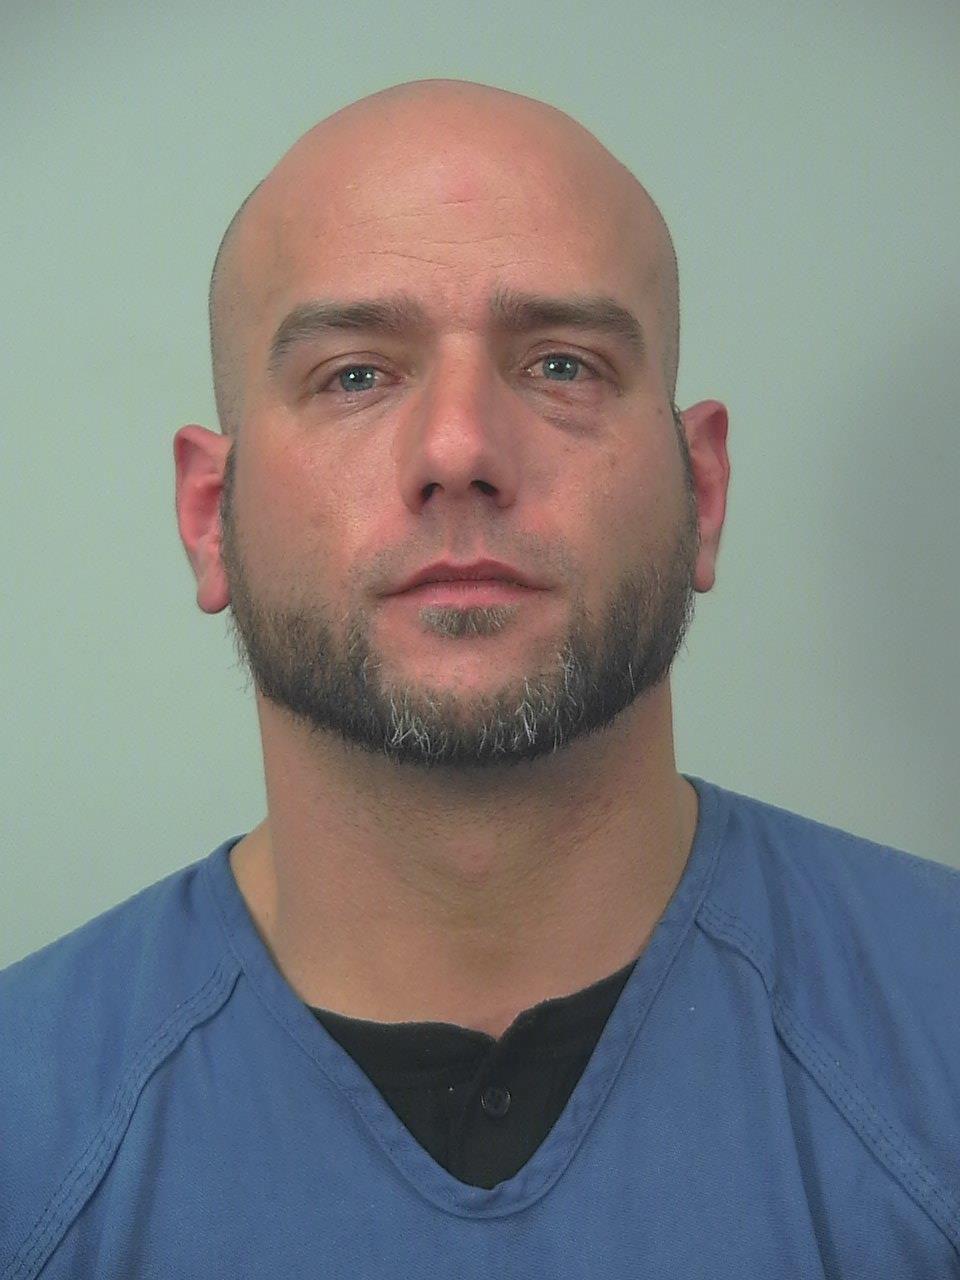 Drug bust yields 8 guns, kilo of cocaine, $60K, Madison police say